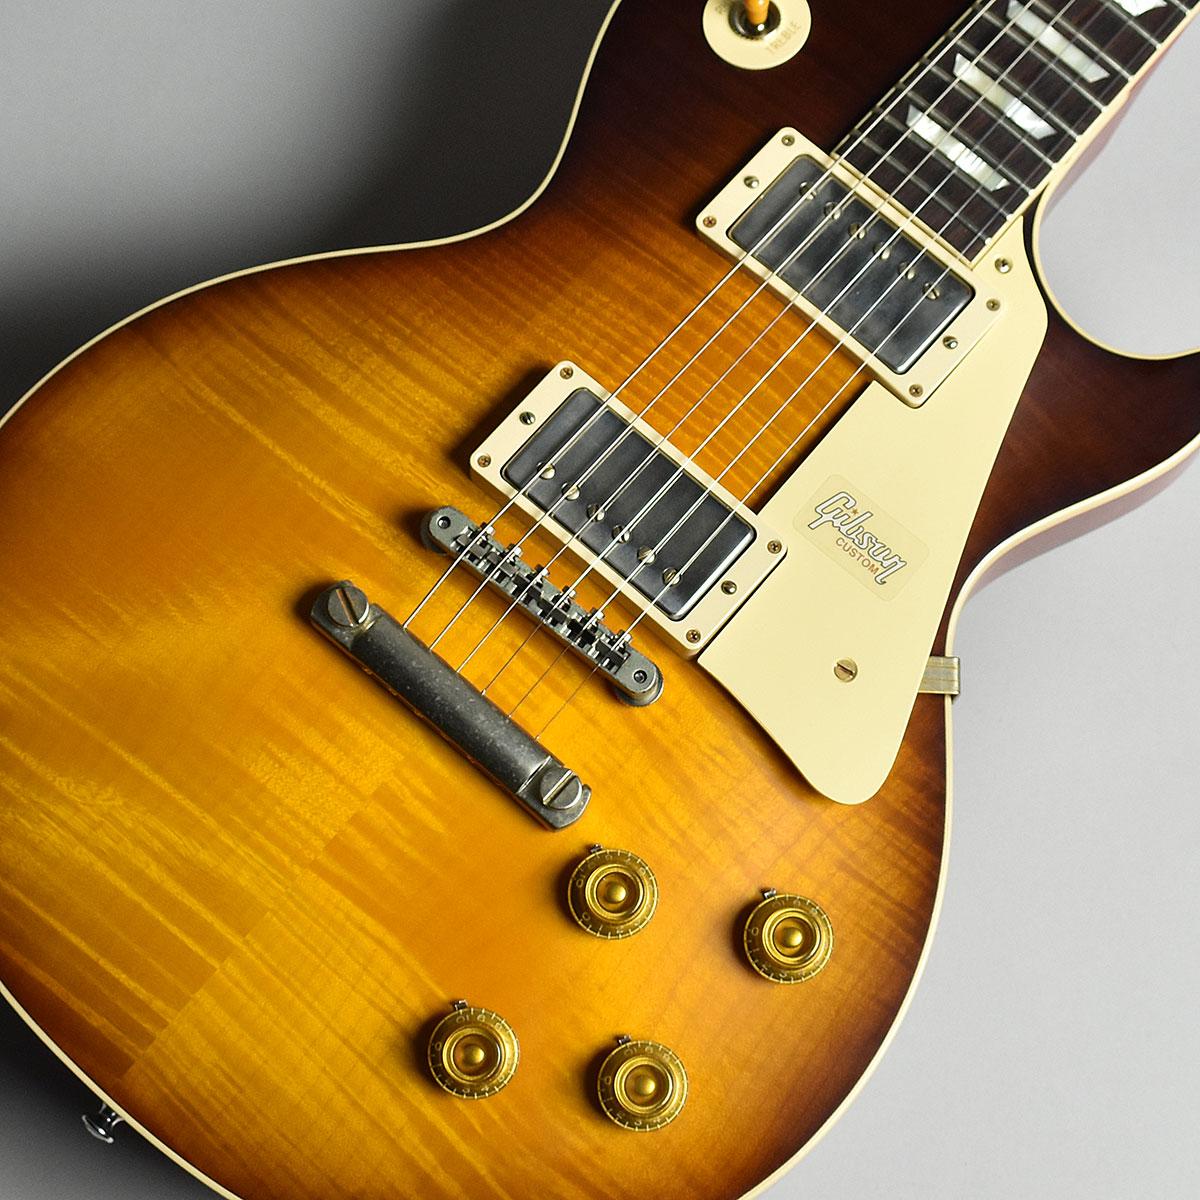 Gibson Custom Shop 1959 Les Paul Standard VOS Kindred Burst Fade S/N:982220 【ギブソン カスタムショップ】【未展示品】